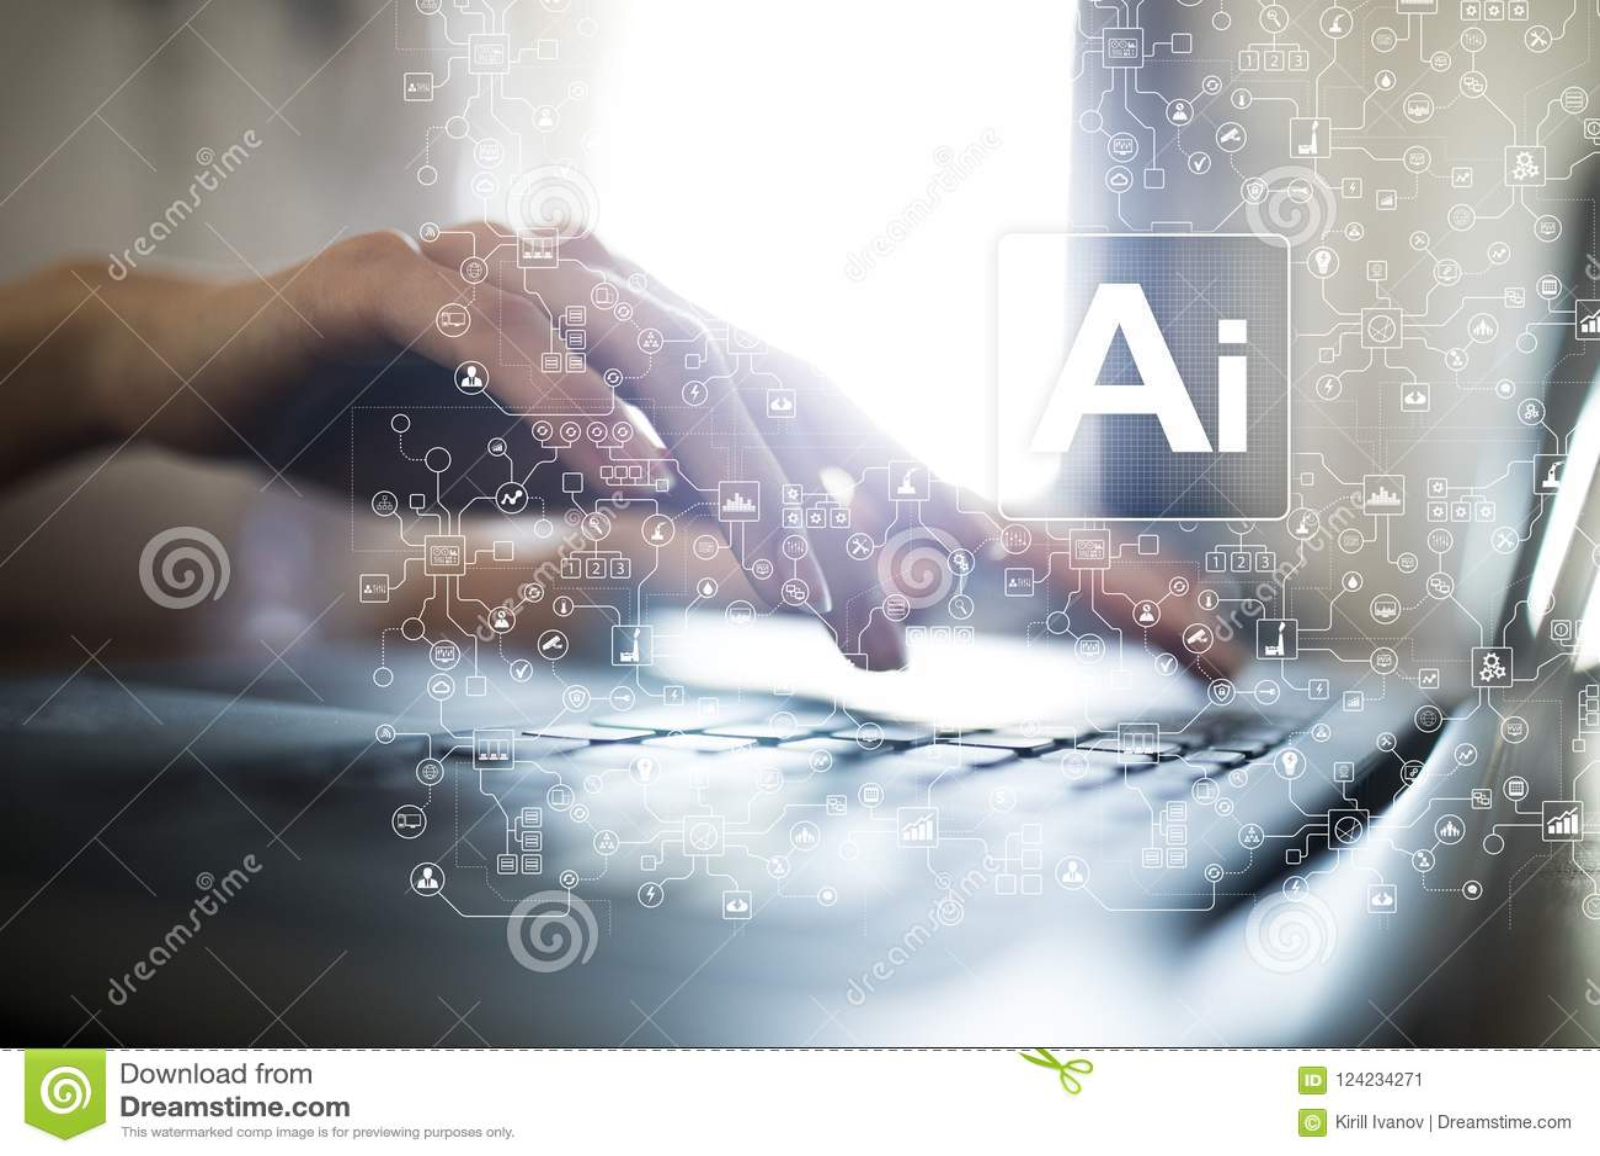 AI, Kunstmatige intelligentie, machine, neurale netwerken en moderne technologieënconcepten die leren IOT en automatisering